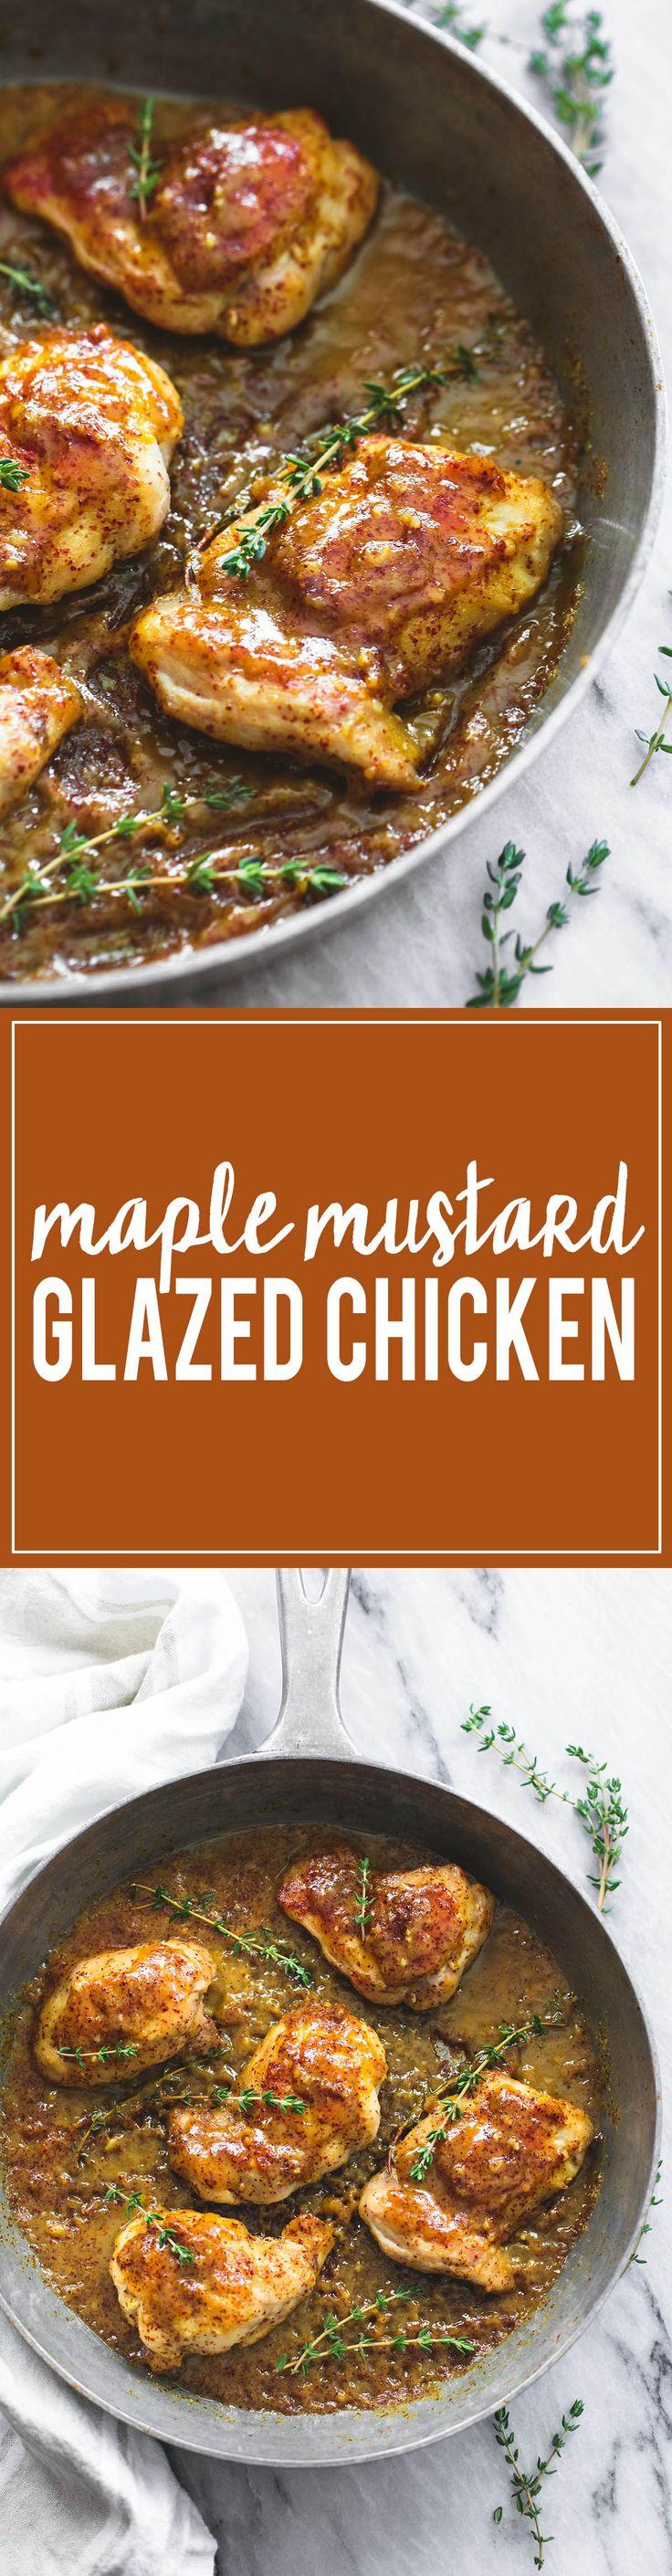 One Pan Maple Mustard Glazed Chicken | lecremedelacrumb.com